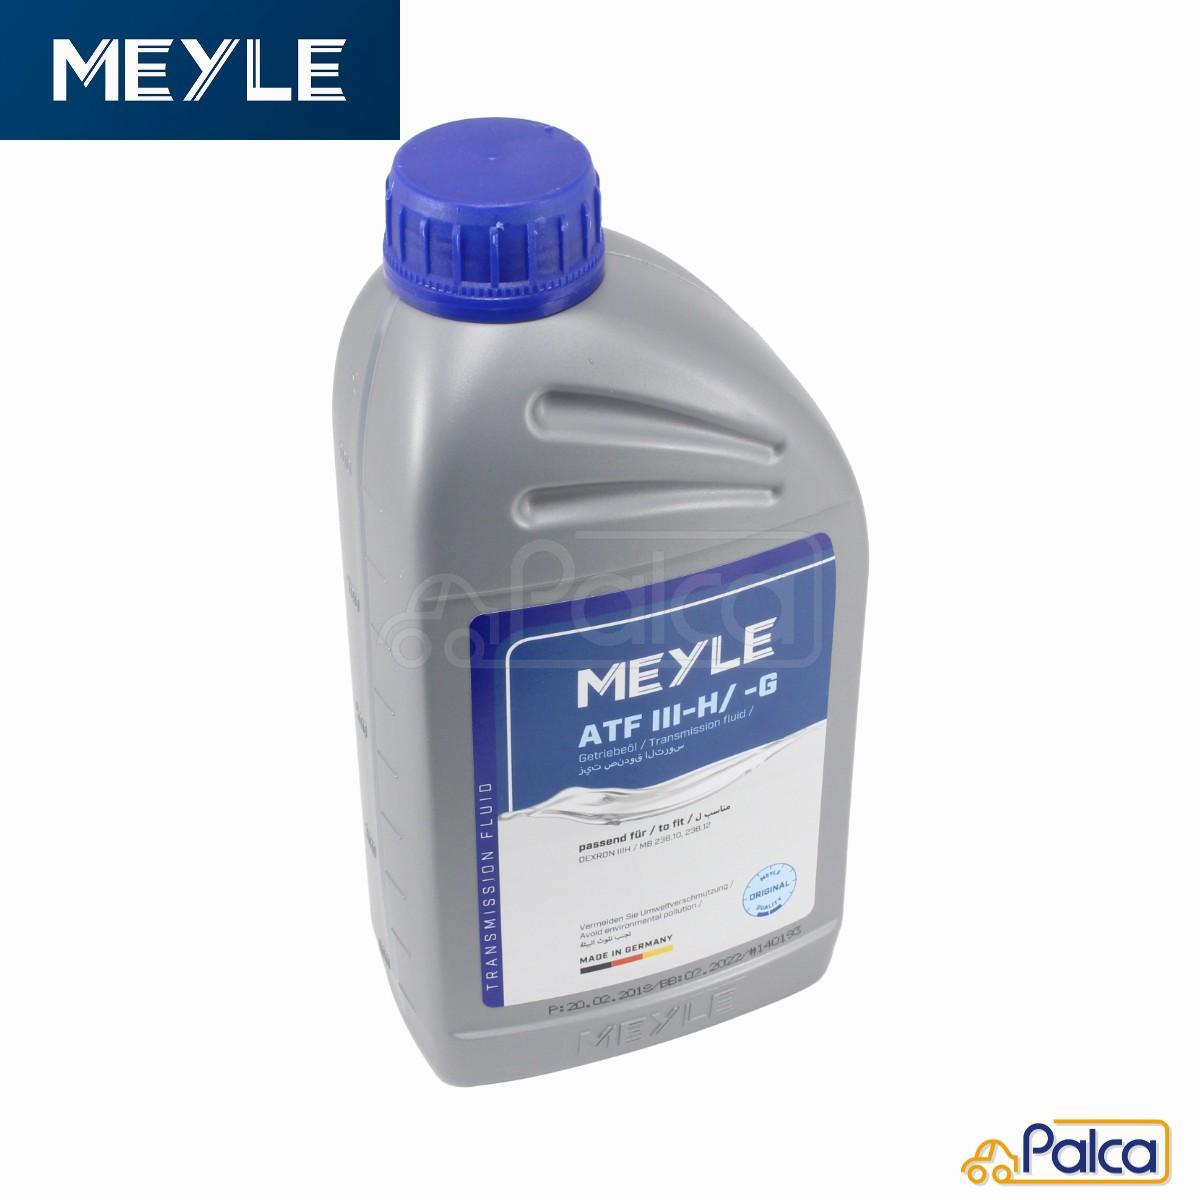 MEYLE製 新品 あす楽 メルセデス ベンツ アウディ フォルクスワーゲン フォード ATF 0019894503 1L 入荷予定 オイル 3H AL完売しました Dexron 3G G052162A2 オートマチックトランスミッションフルード